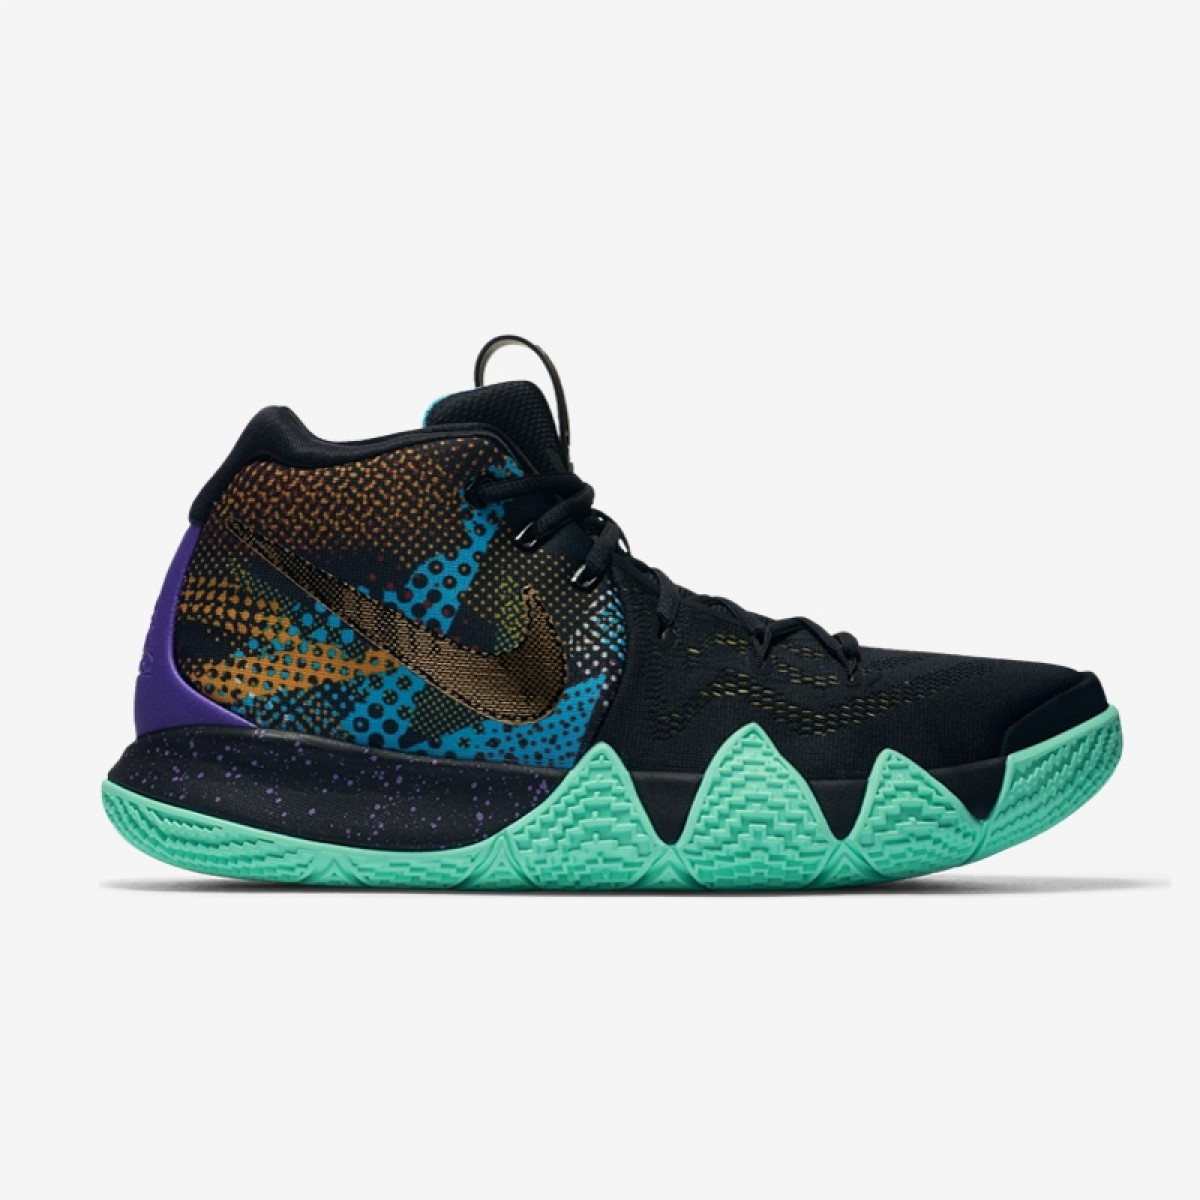 Nike Kyrie 4 'Mamba'